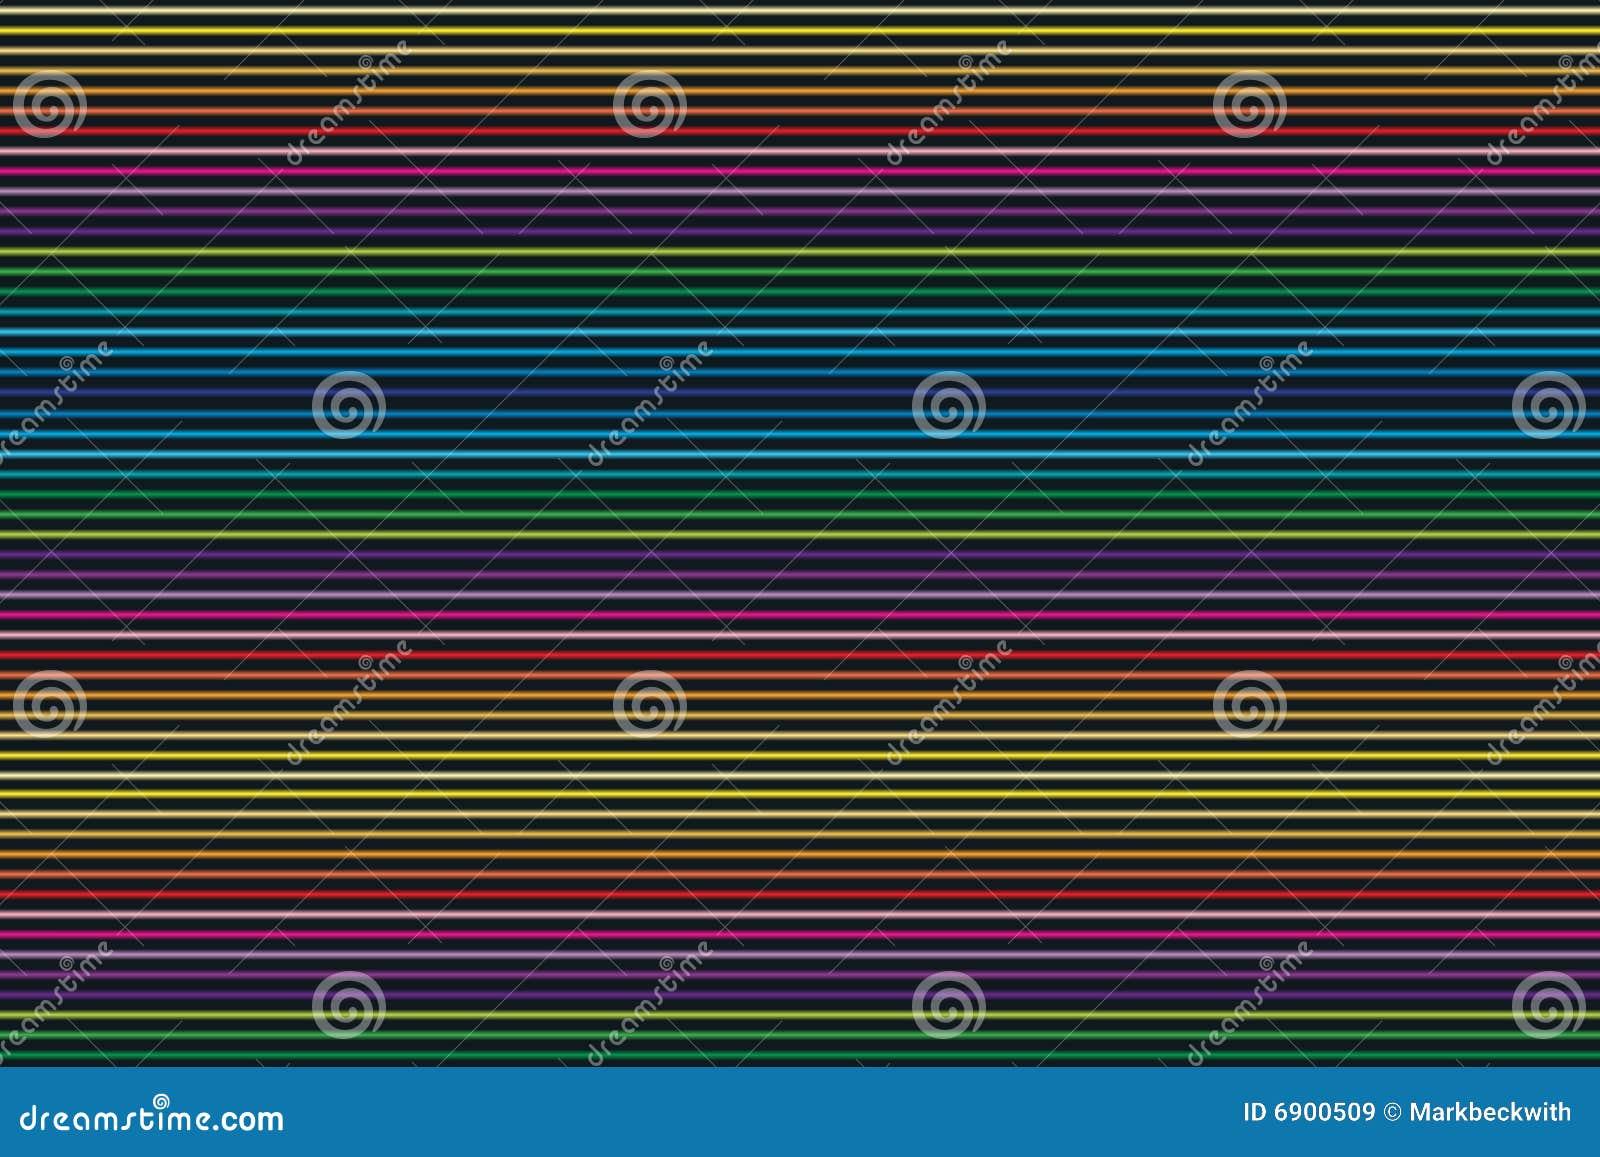 Horizontale lijnensamenvatting